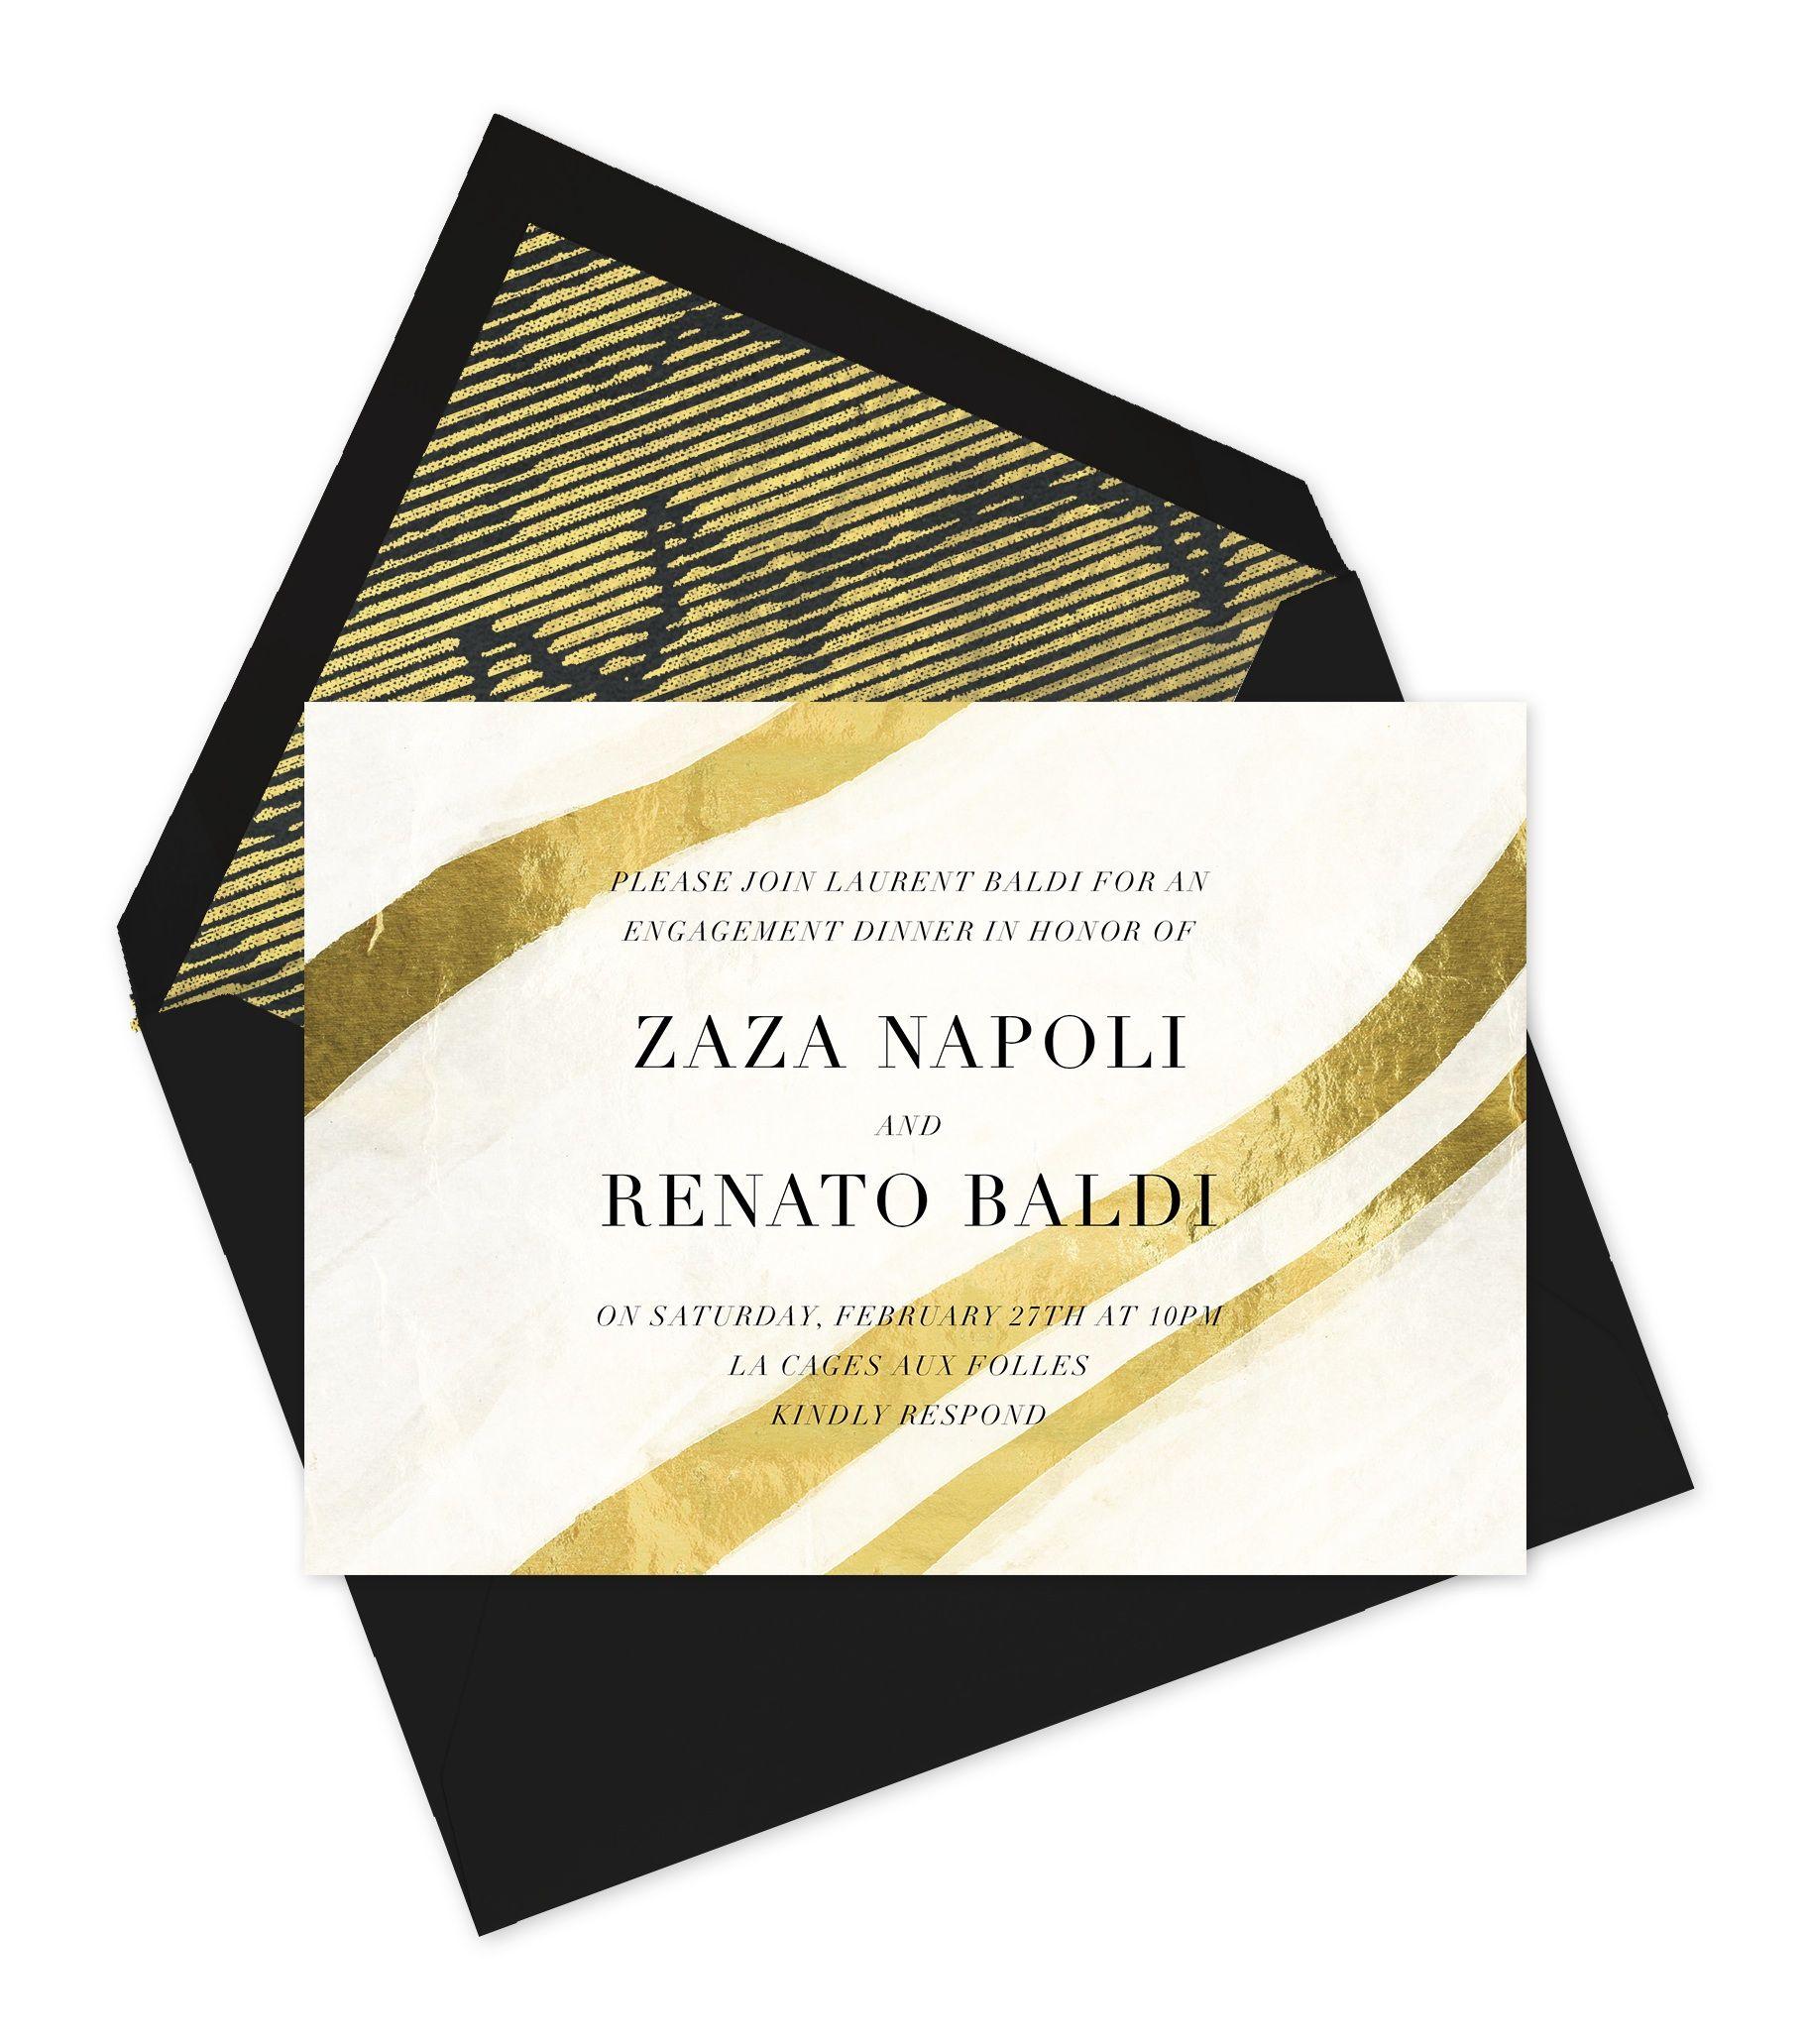 Paperless Post #invite #invitation | Design | Pinterest | Paperless ...